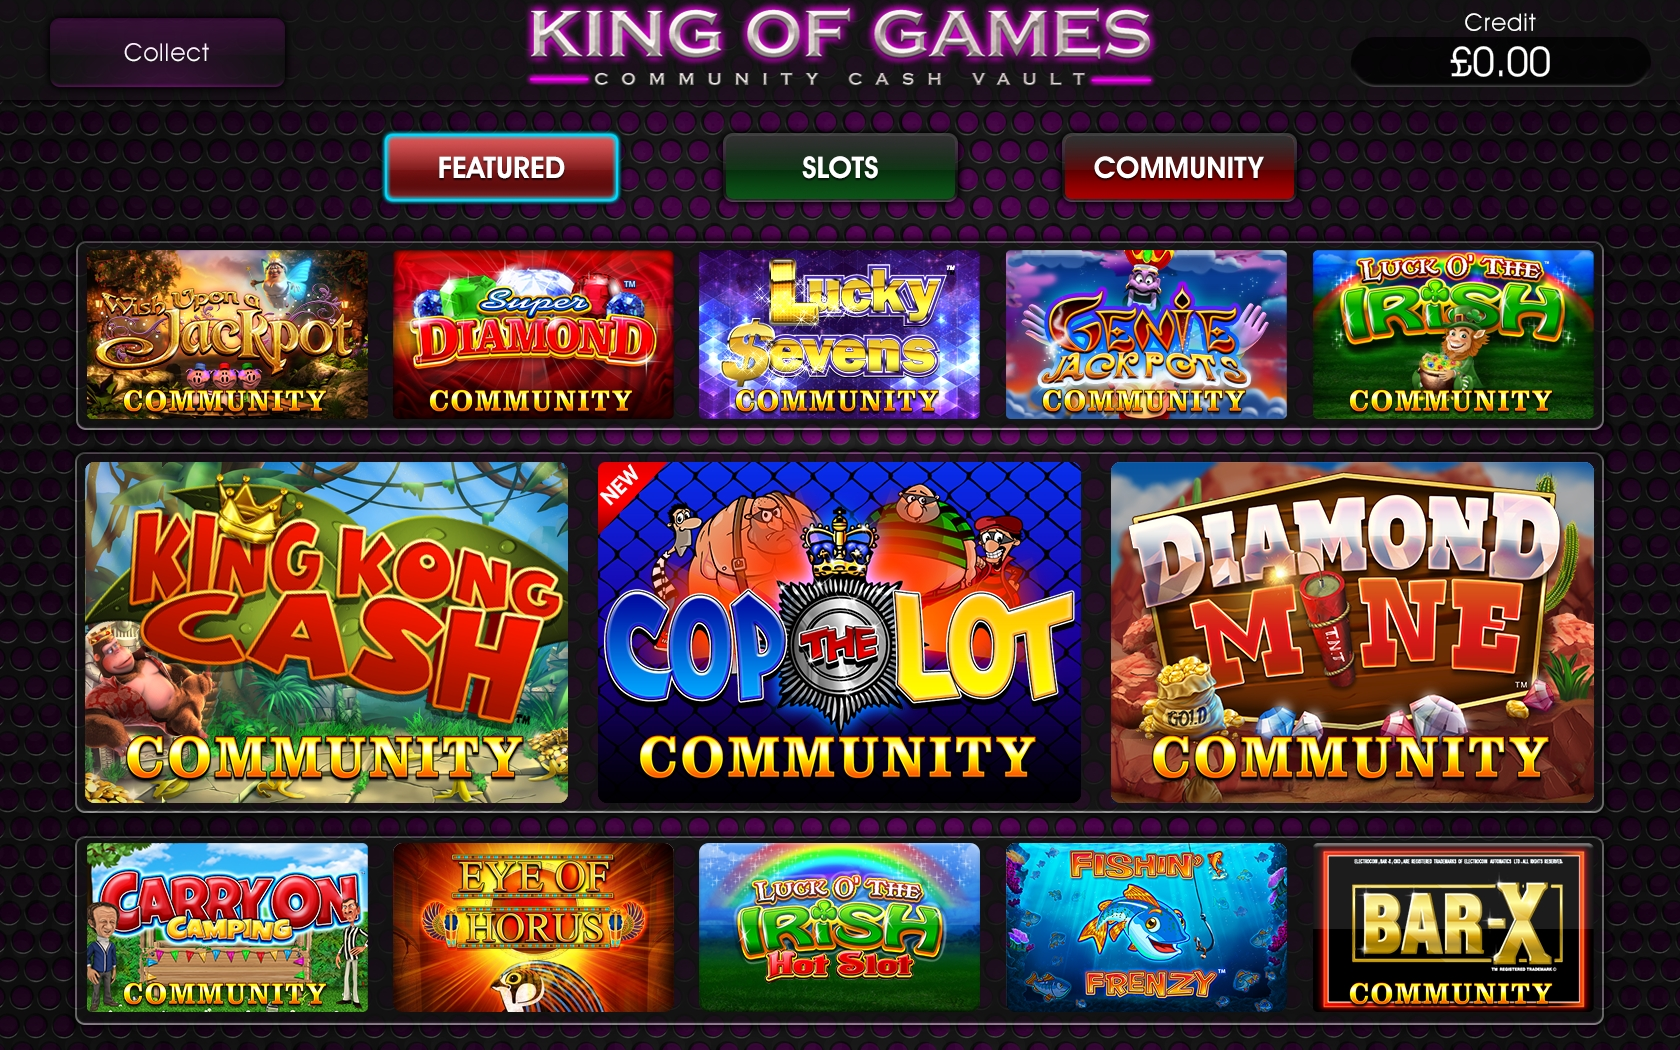 Community Cash Vault